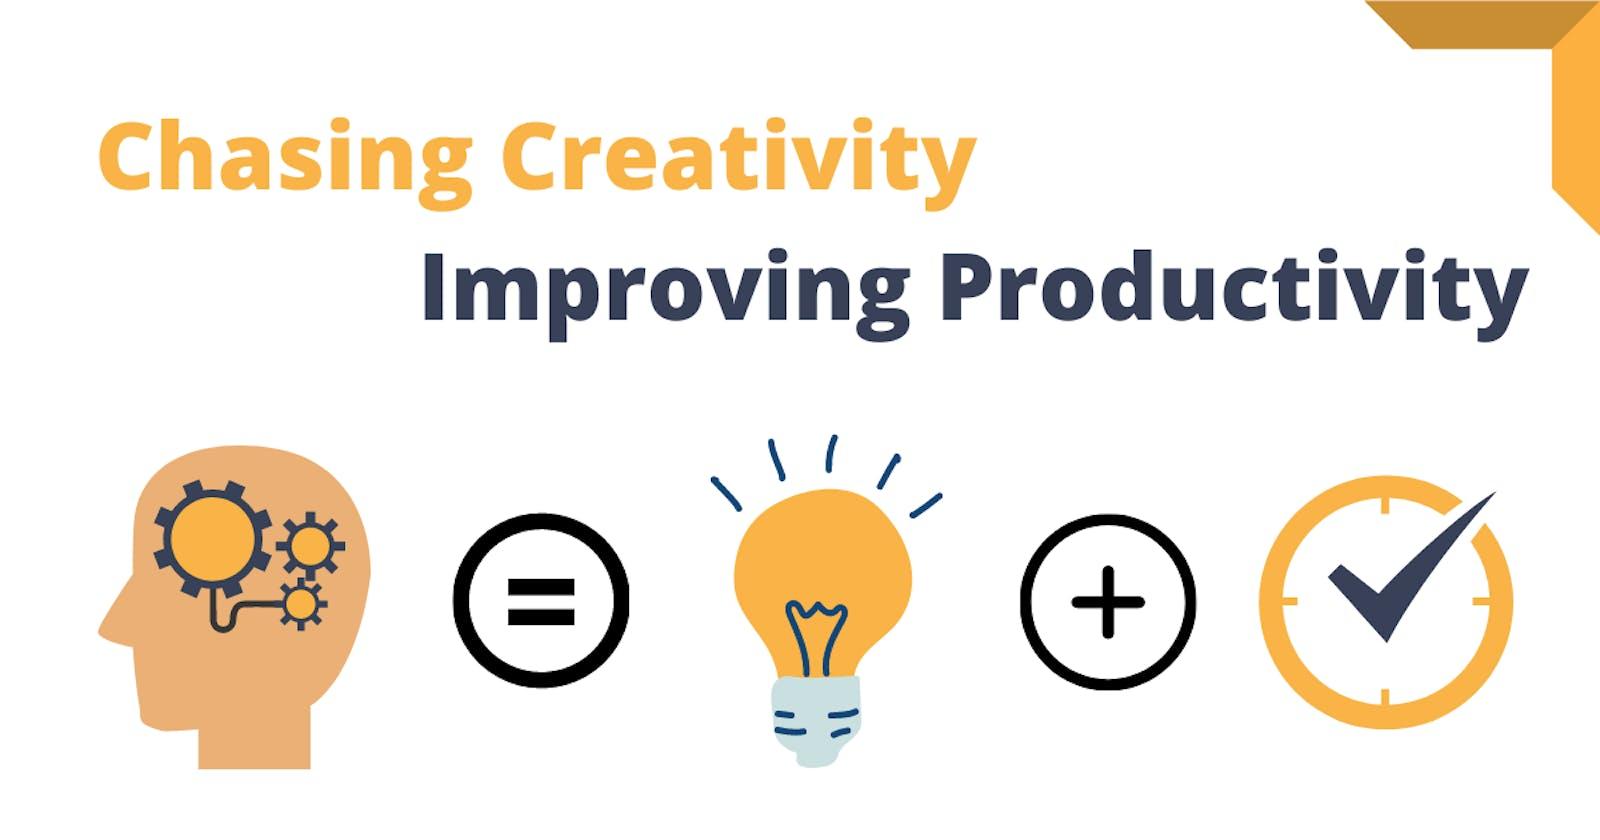 Chasing Creativity & Improving Productivity